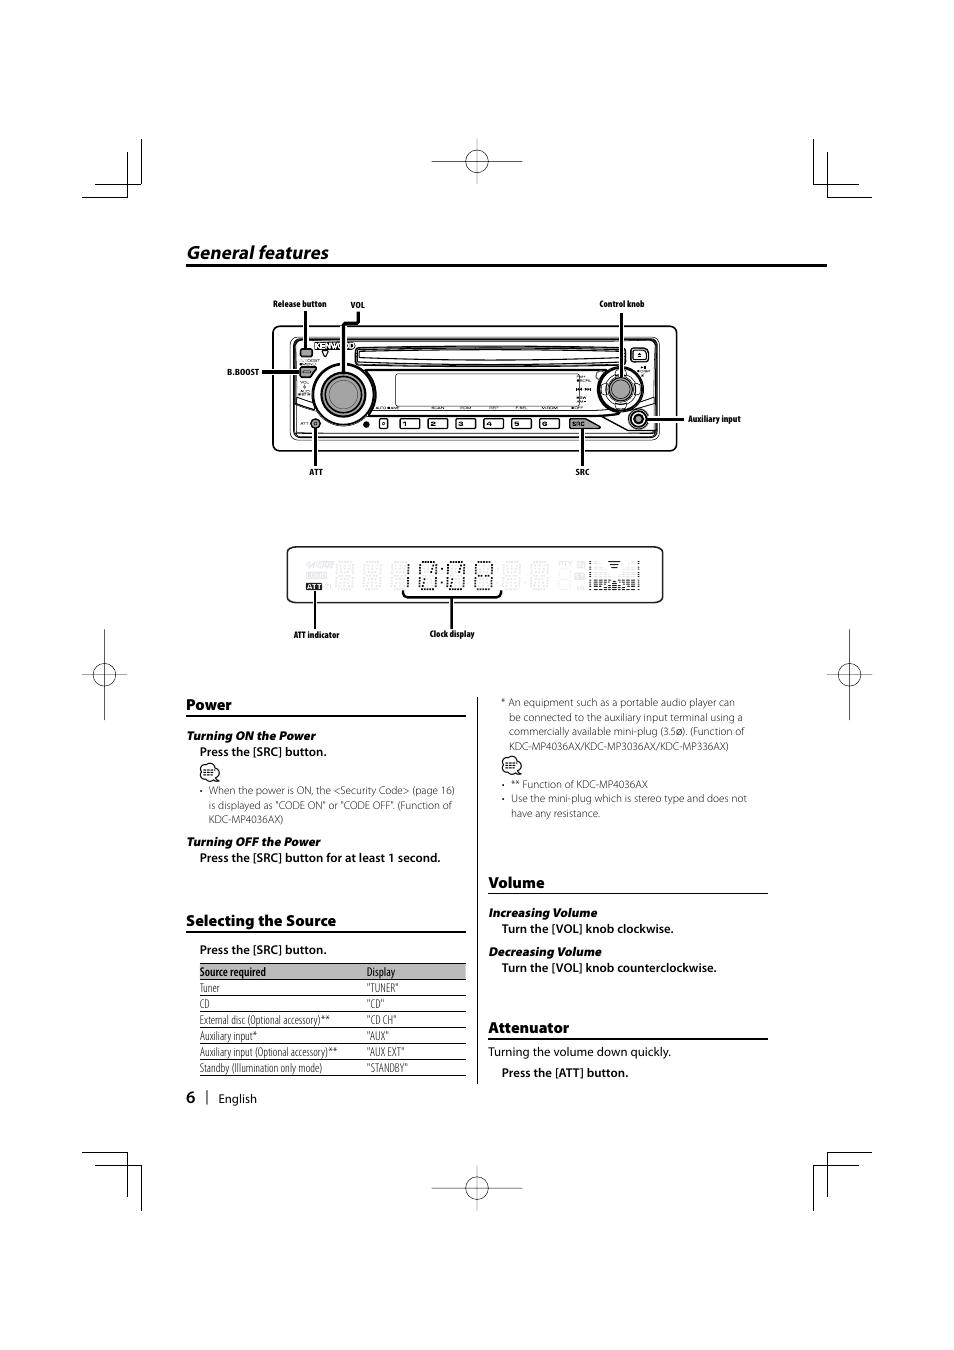 general features power selecting the source kenwood kdc mp336ax rh manualsdir com Kenwood eXcelon Manual Kenwood Car Stereo Manual